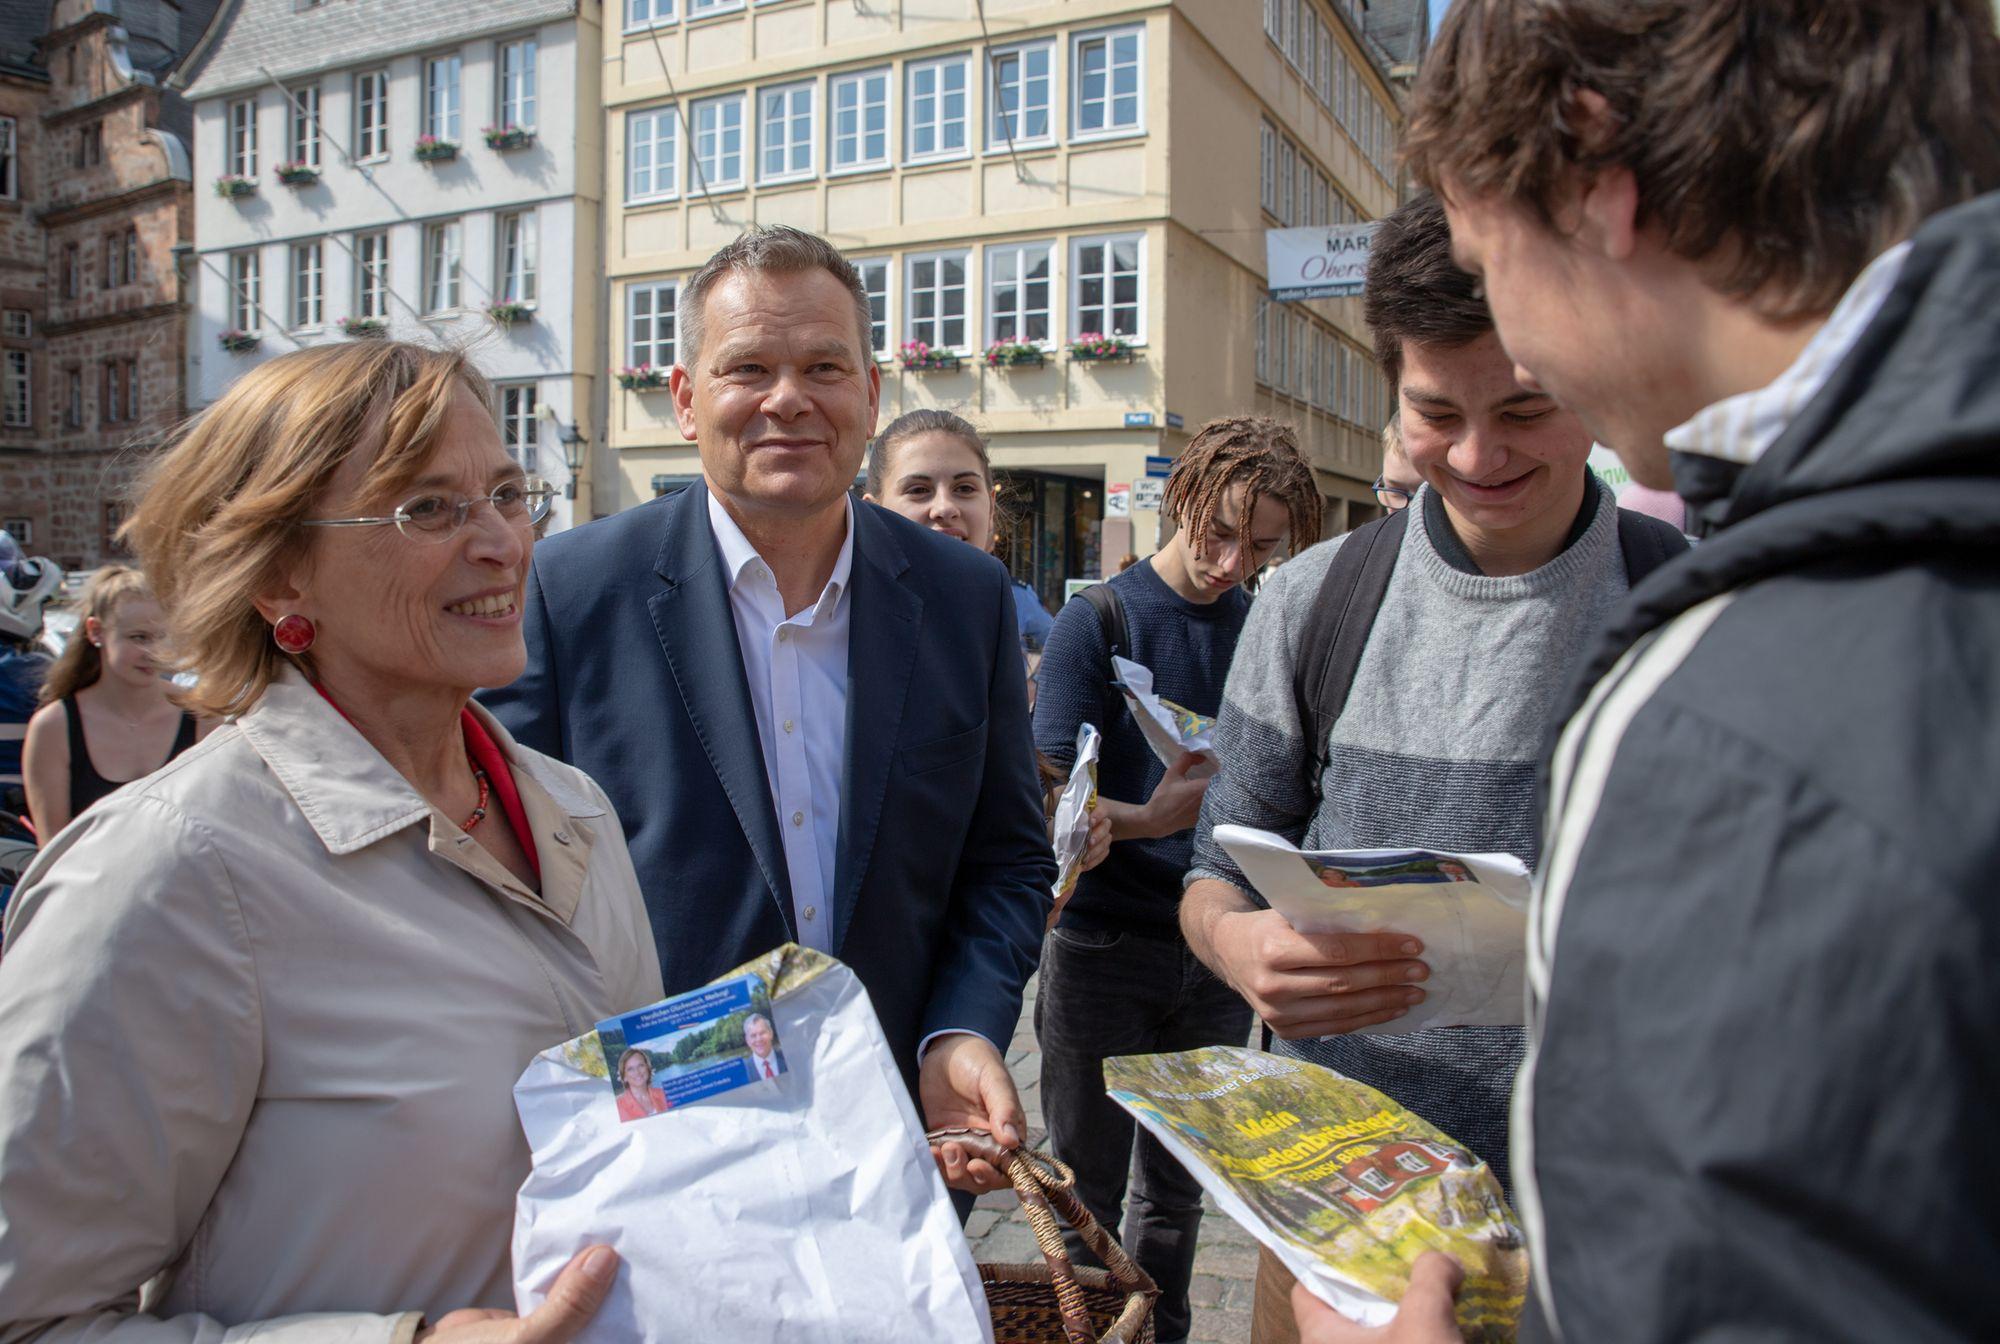 OB Dietlind Grabe-Bolz vrteilt mit Marburger OB Dr. Spies Knusperstangen in Marburg